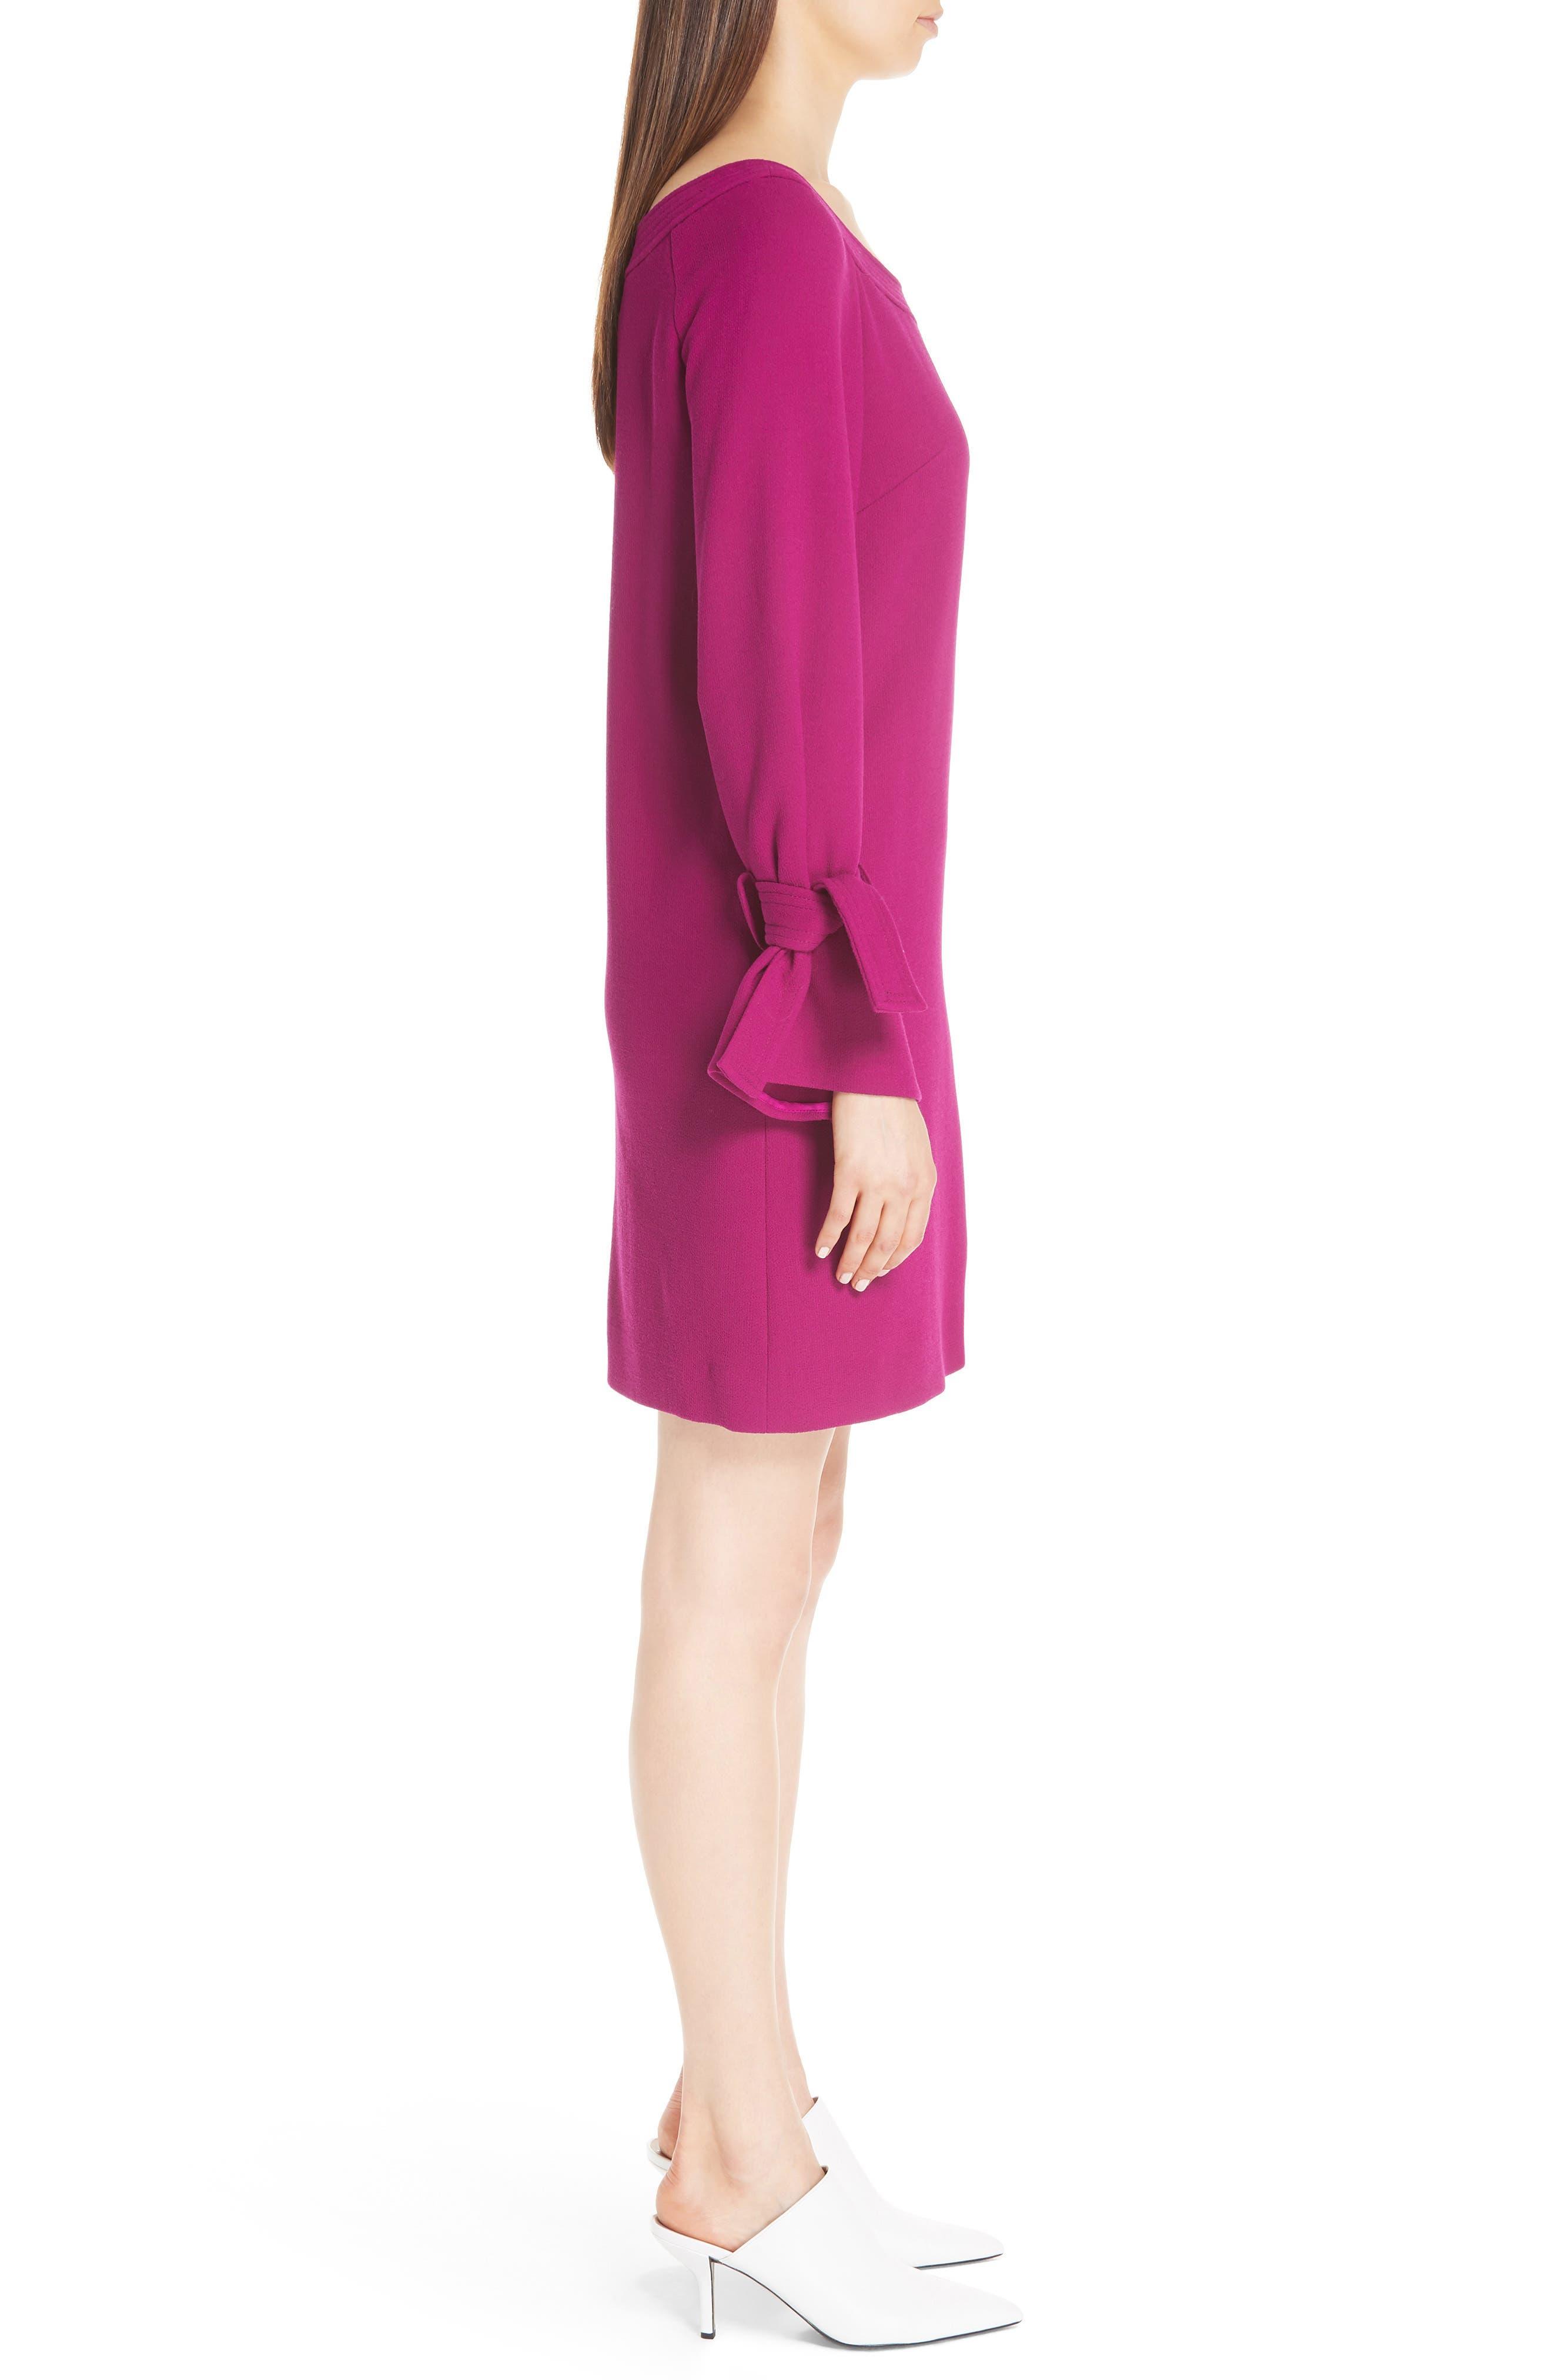 LELA ROSE, Tie Cuff Wool Blend Crepe Shift Dress, Alternate thumbnail 3, color, MAGENTA